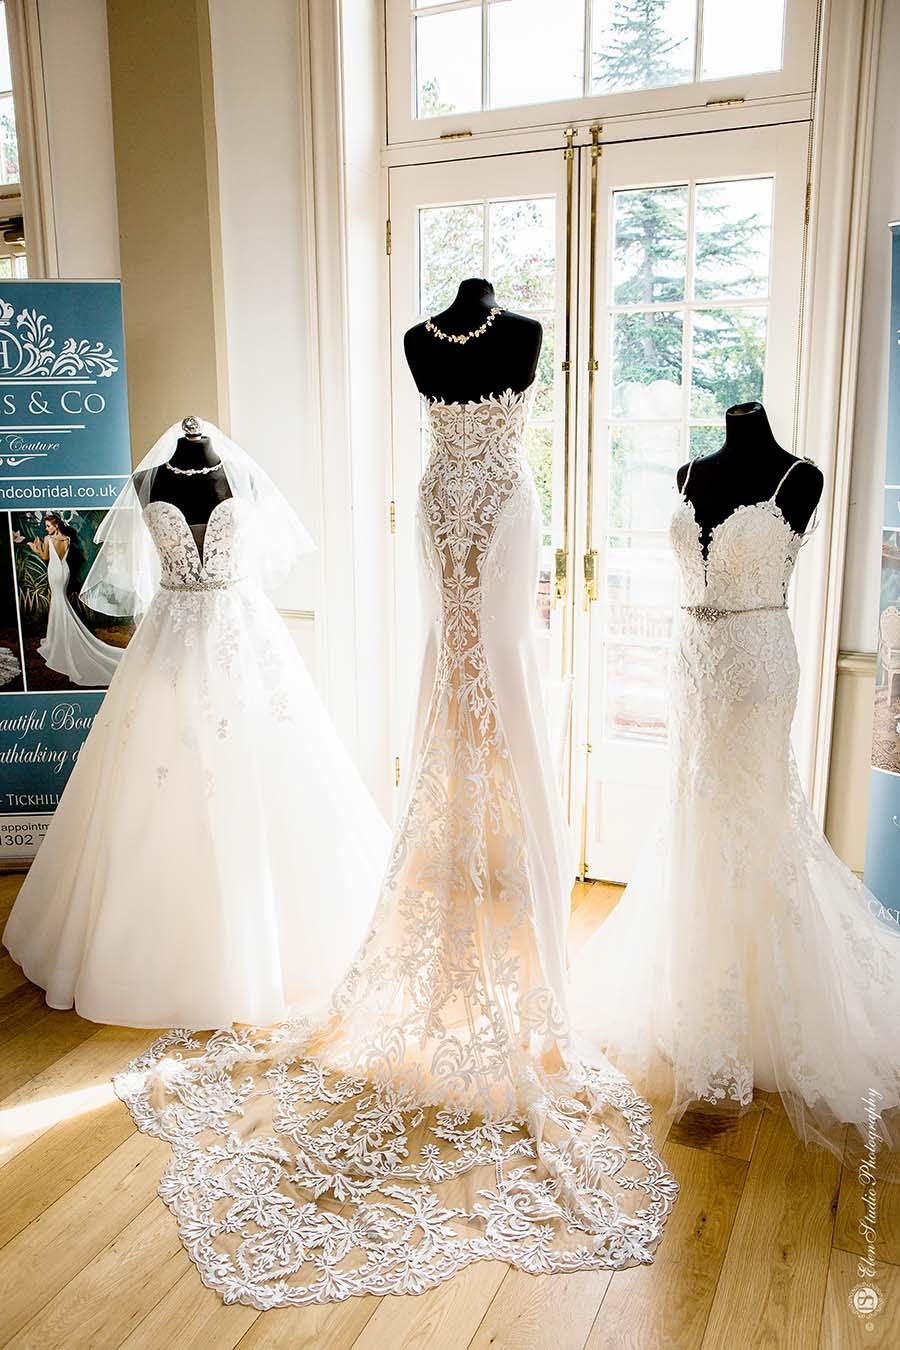 Hodsock-priory-wedding-fair-Elen-Studio-Photography-031